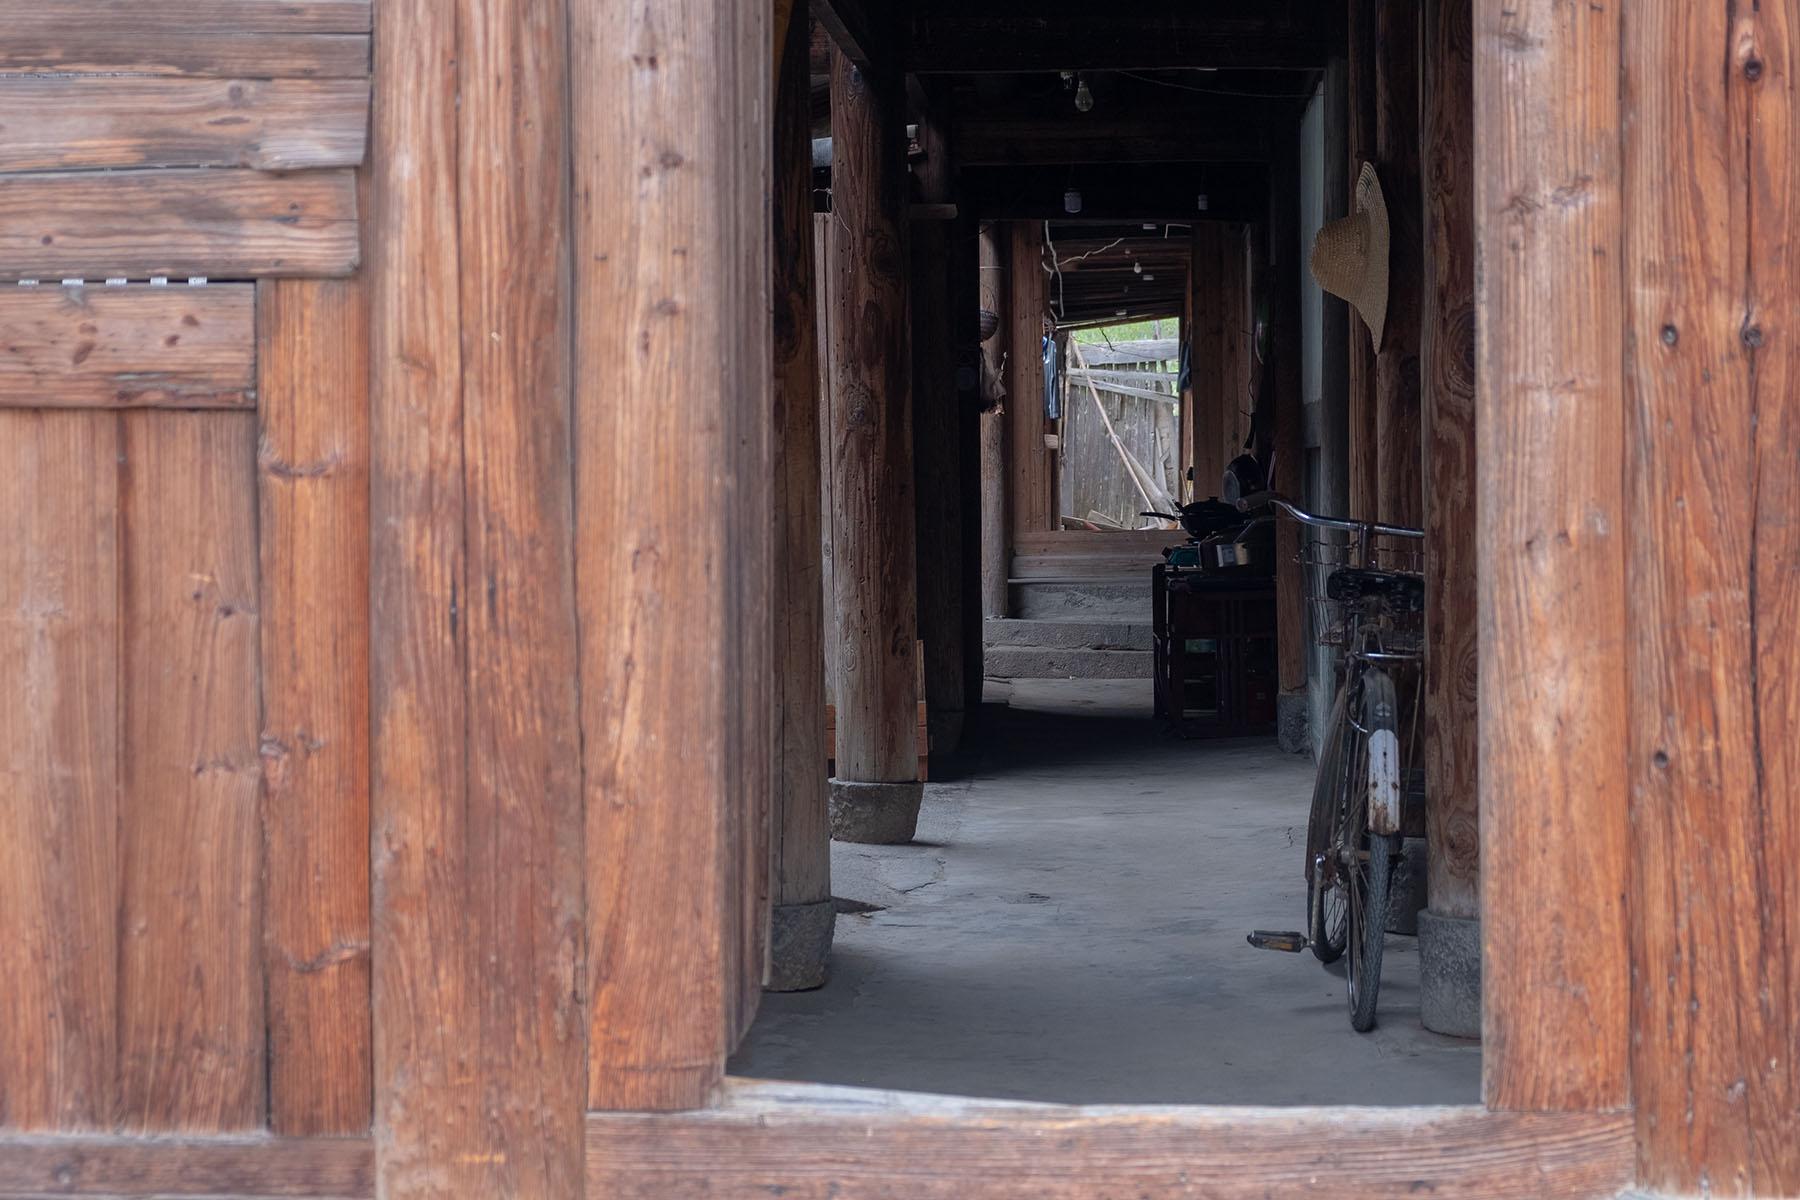 Eingang zu einem alten Gebäude in Songkou in Fujian, China